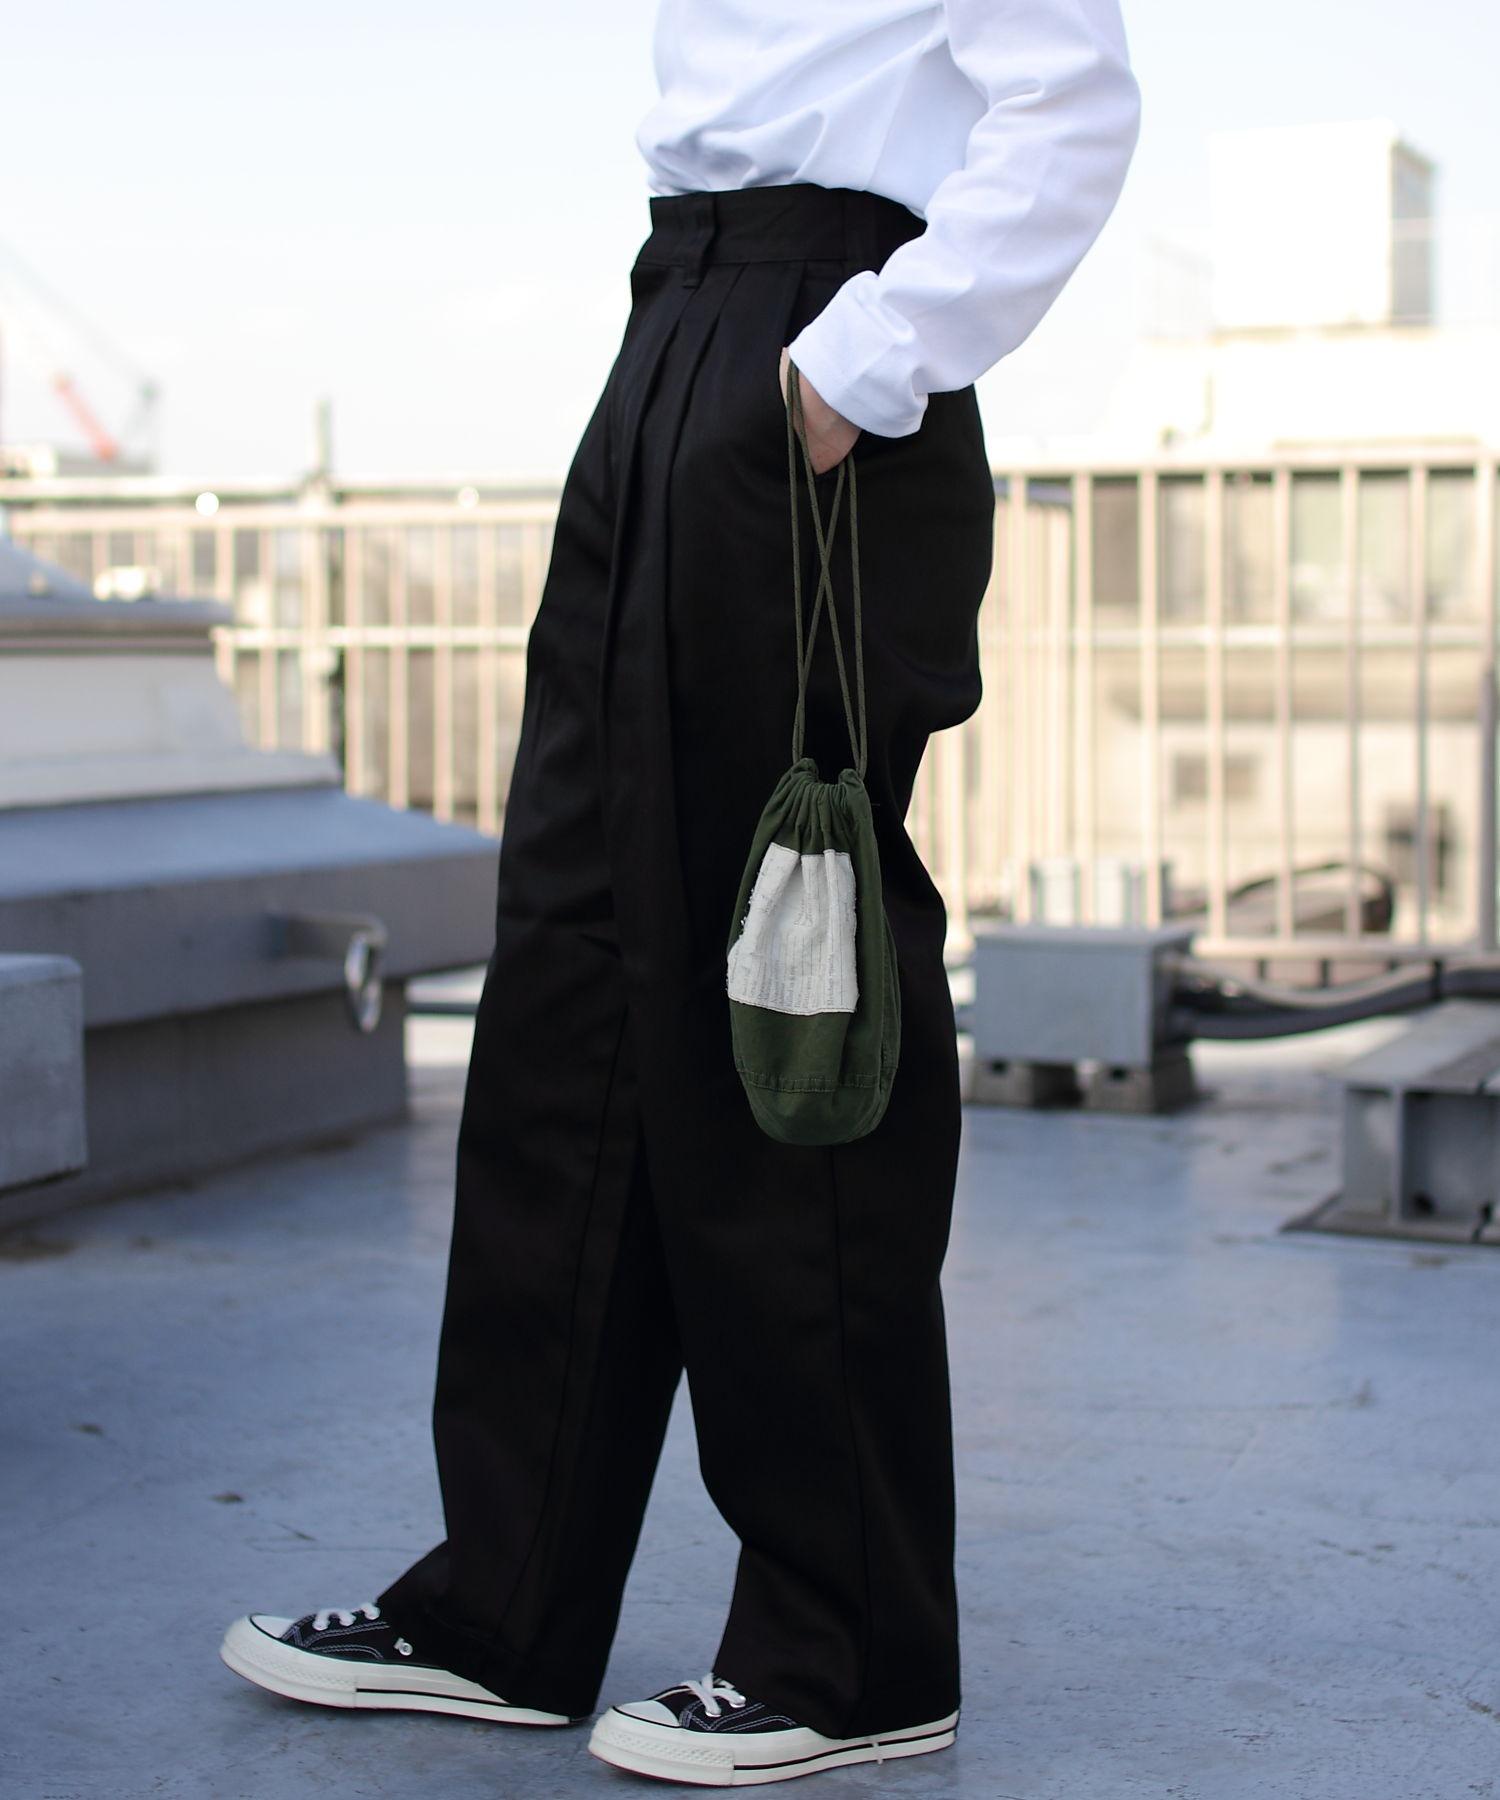 THE SHINZONE / シンゾーン トムボーイパンツ TOM BOY PANTS